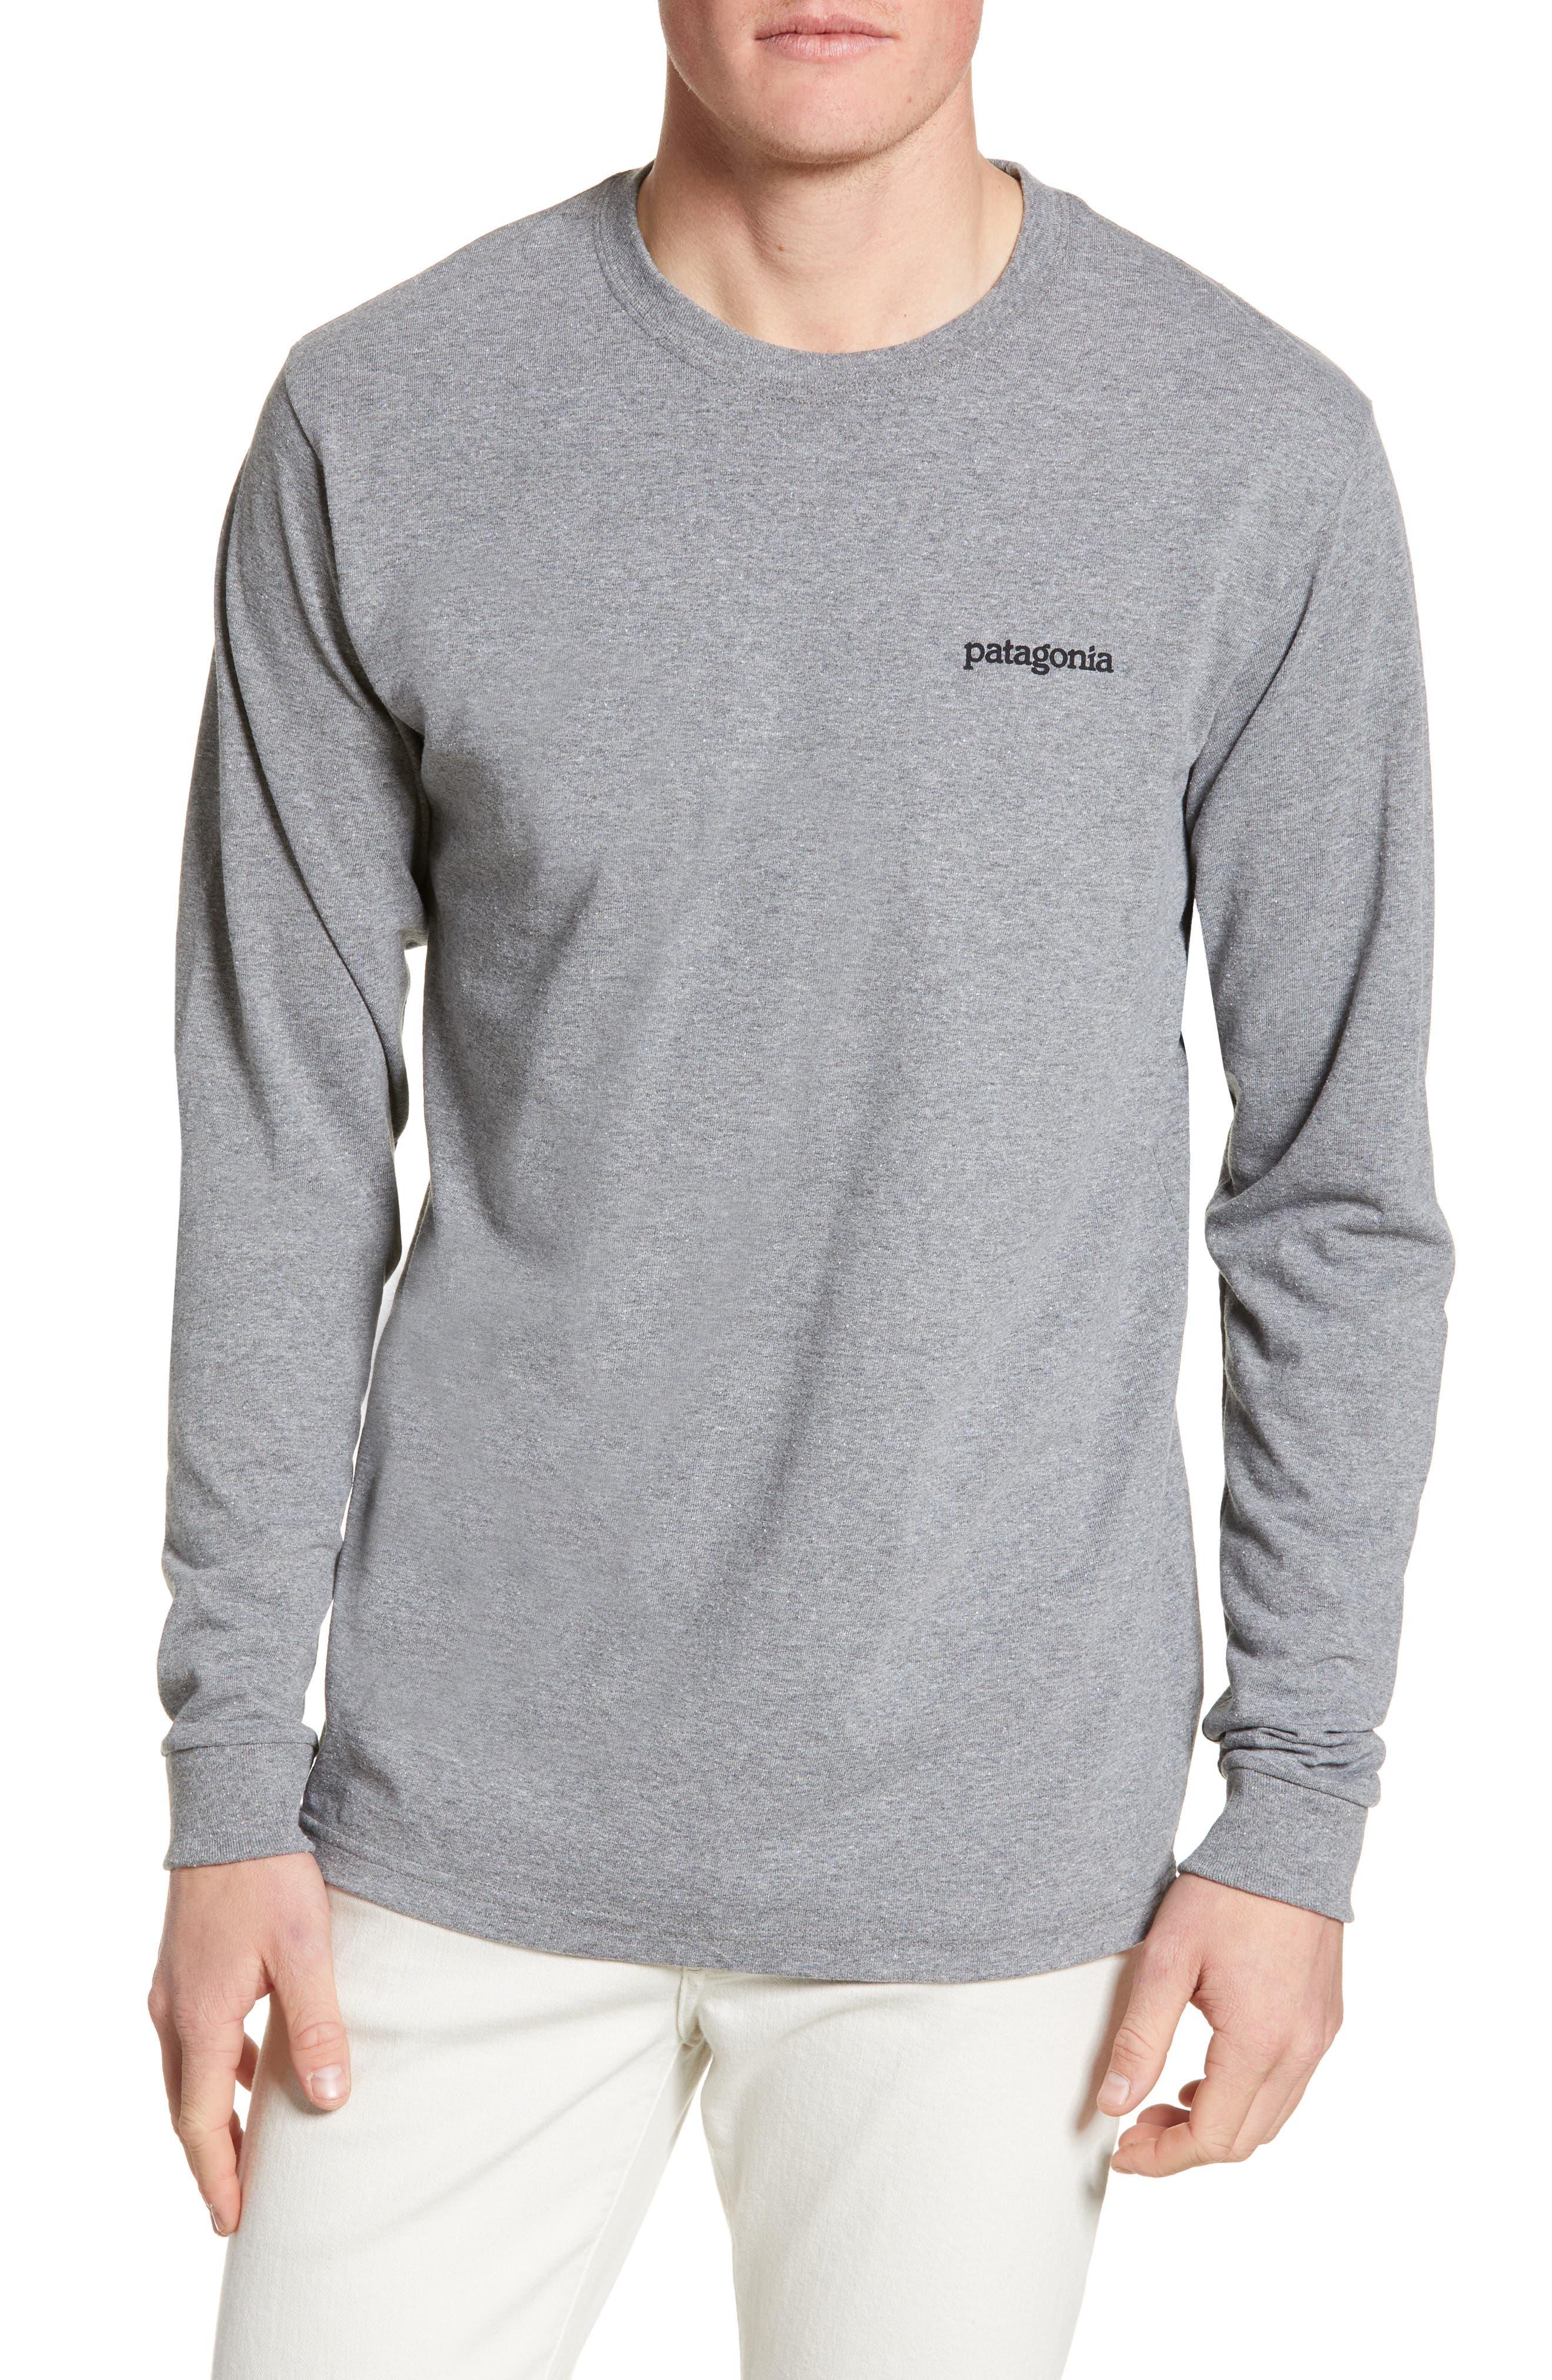 Patagonia Fitz Roy Horizons Graphic Long Sleeve Responsibili-Tee T-Shirt, Grey